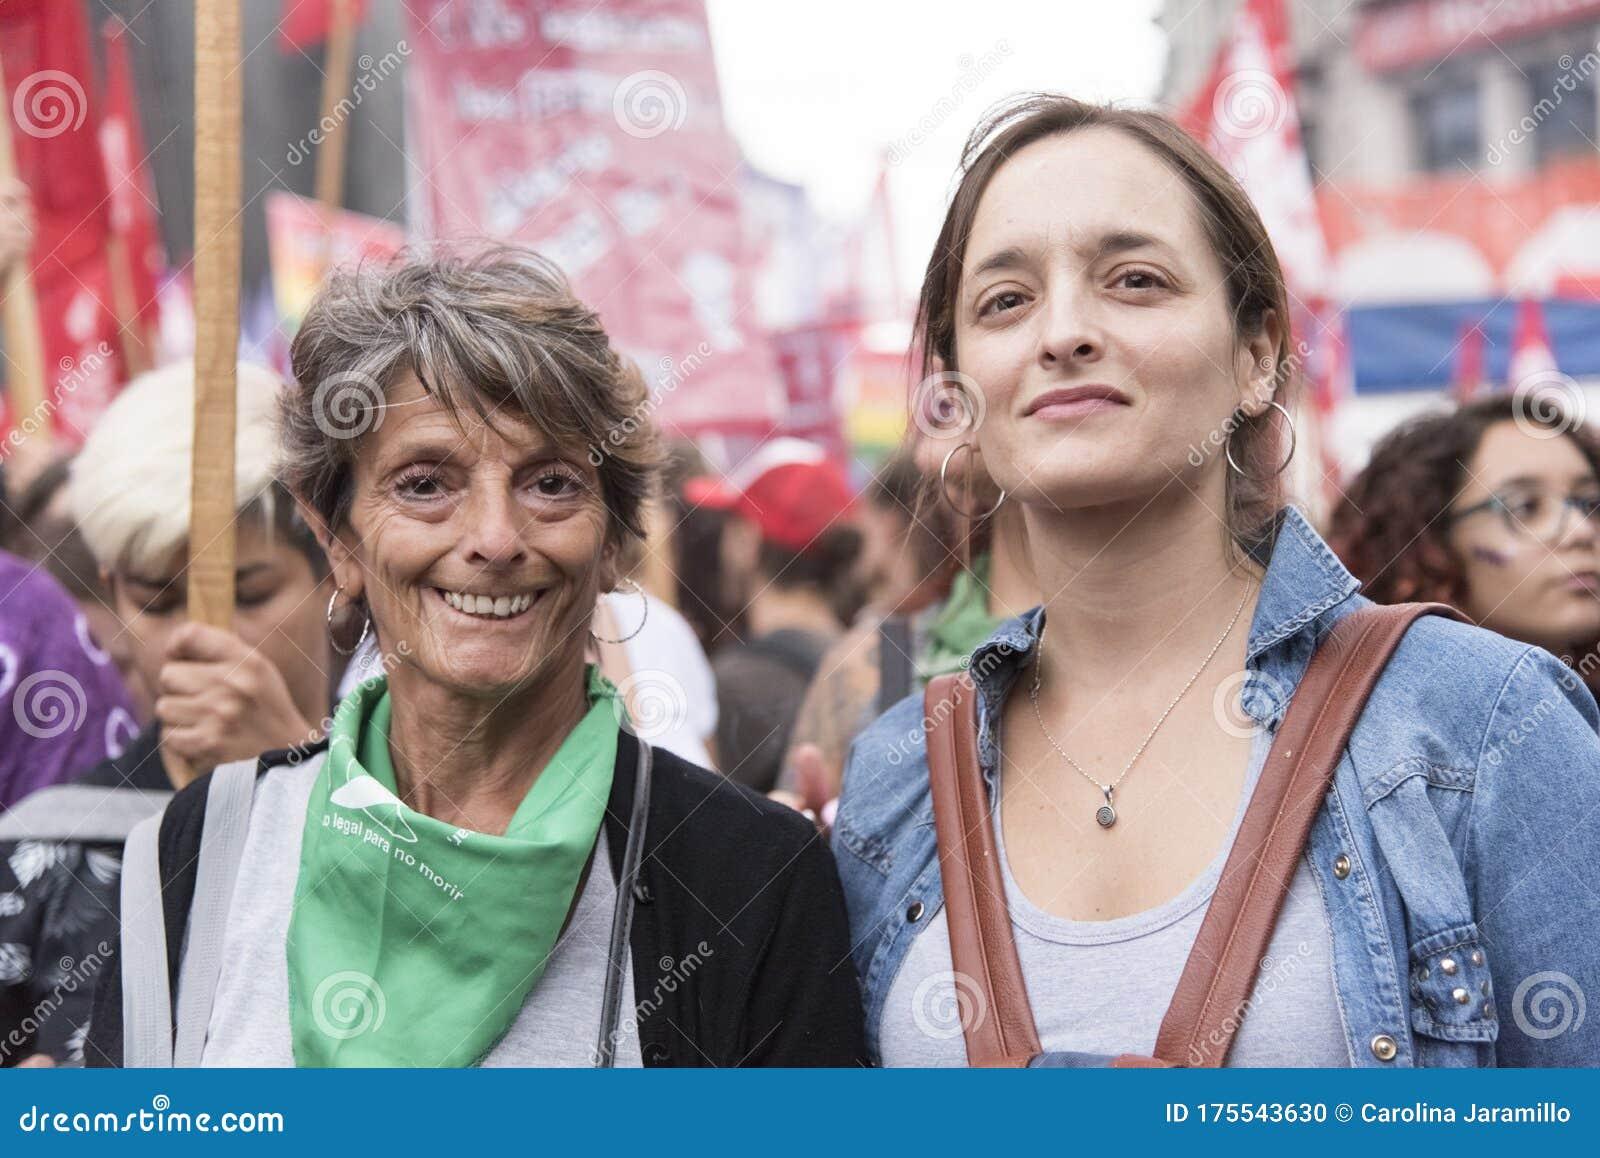 argentinan women